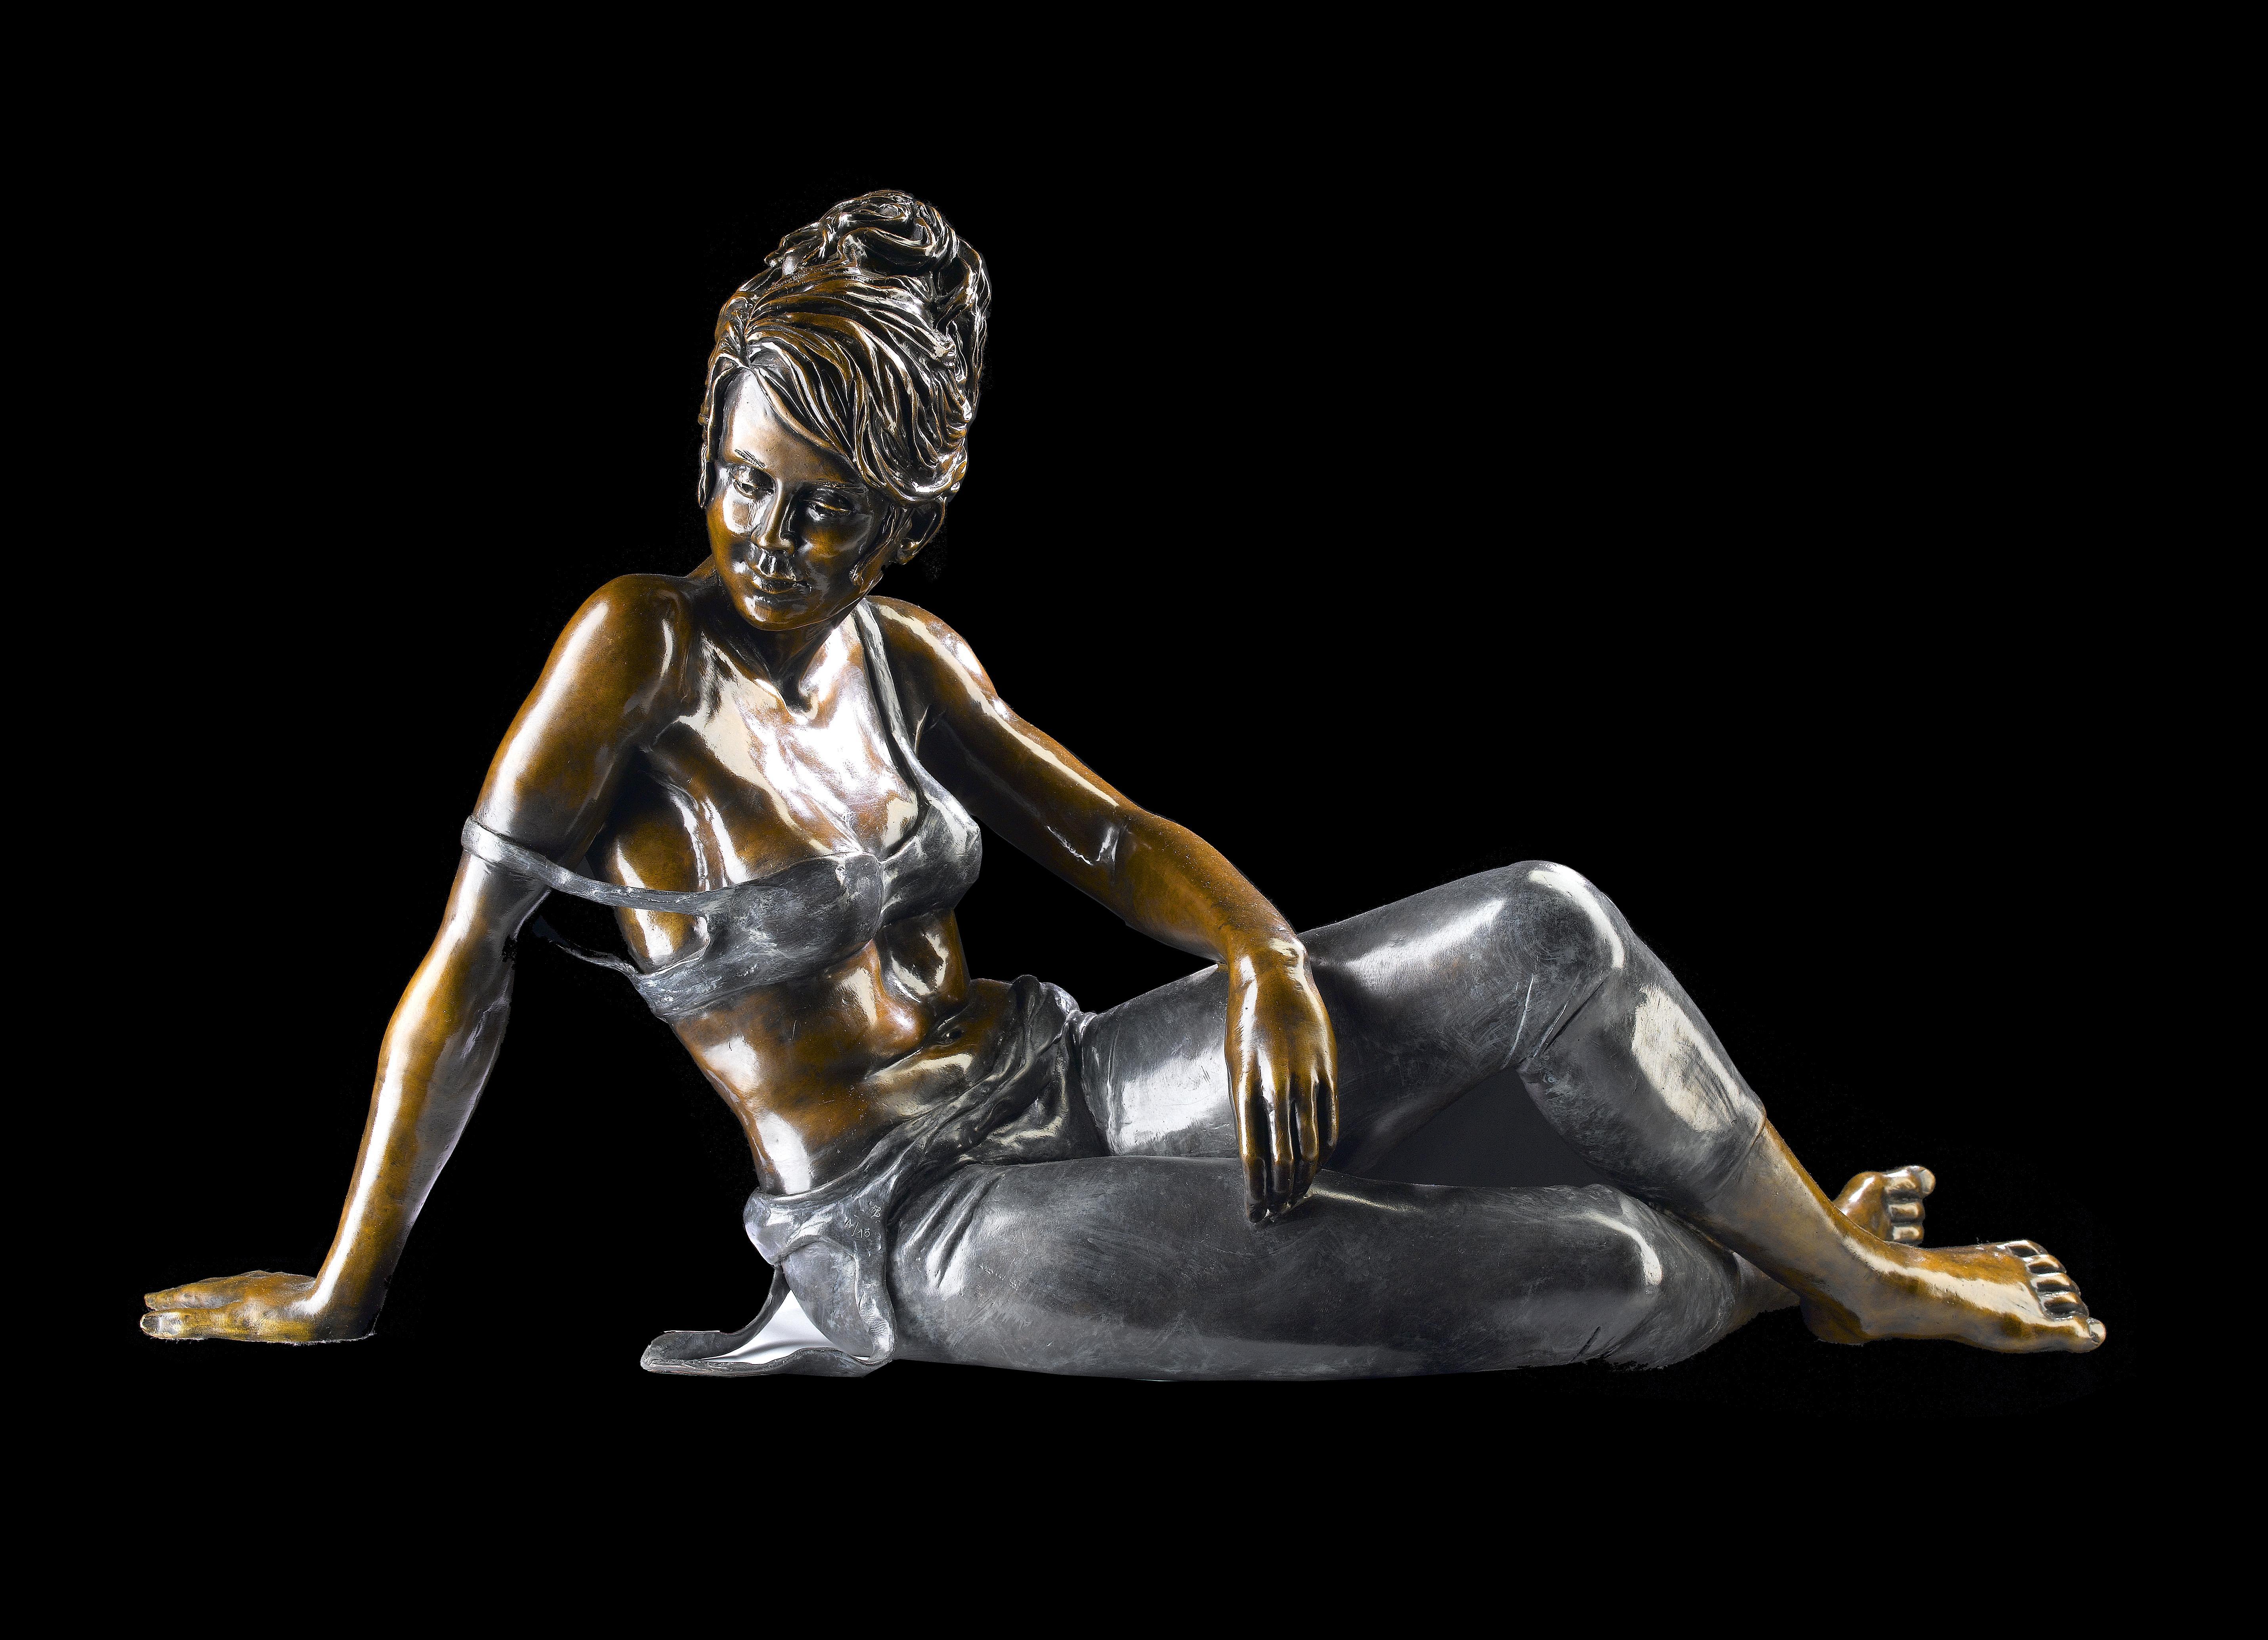 Resting. A bronze sculpture of a resting ballet dancer figure by Benson Landes